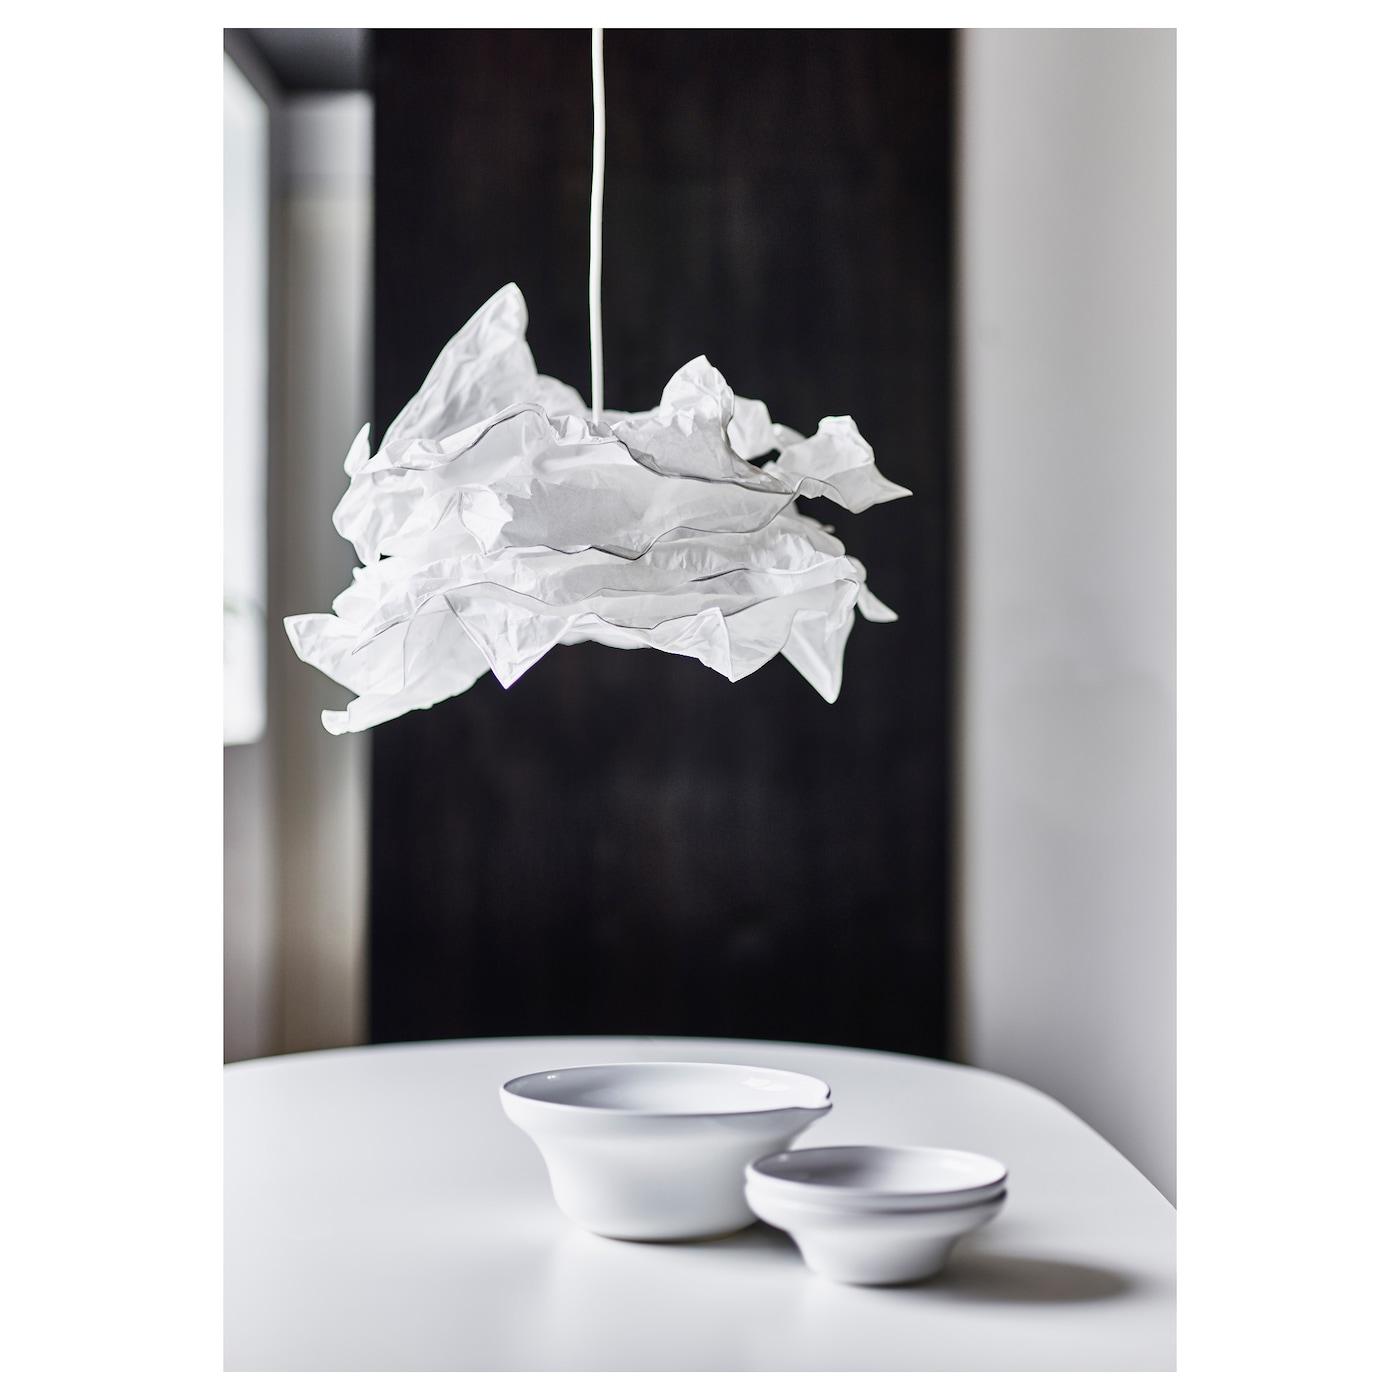 KRUSNING Pendant Lamp Shade White 43 Cm